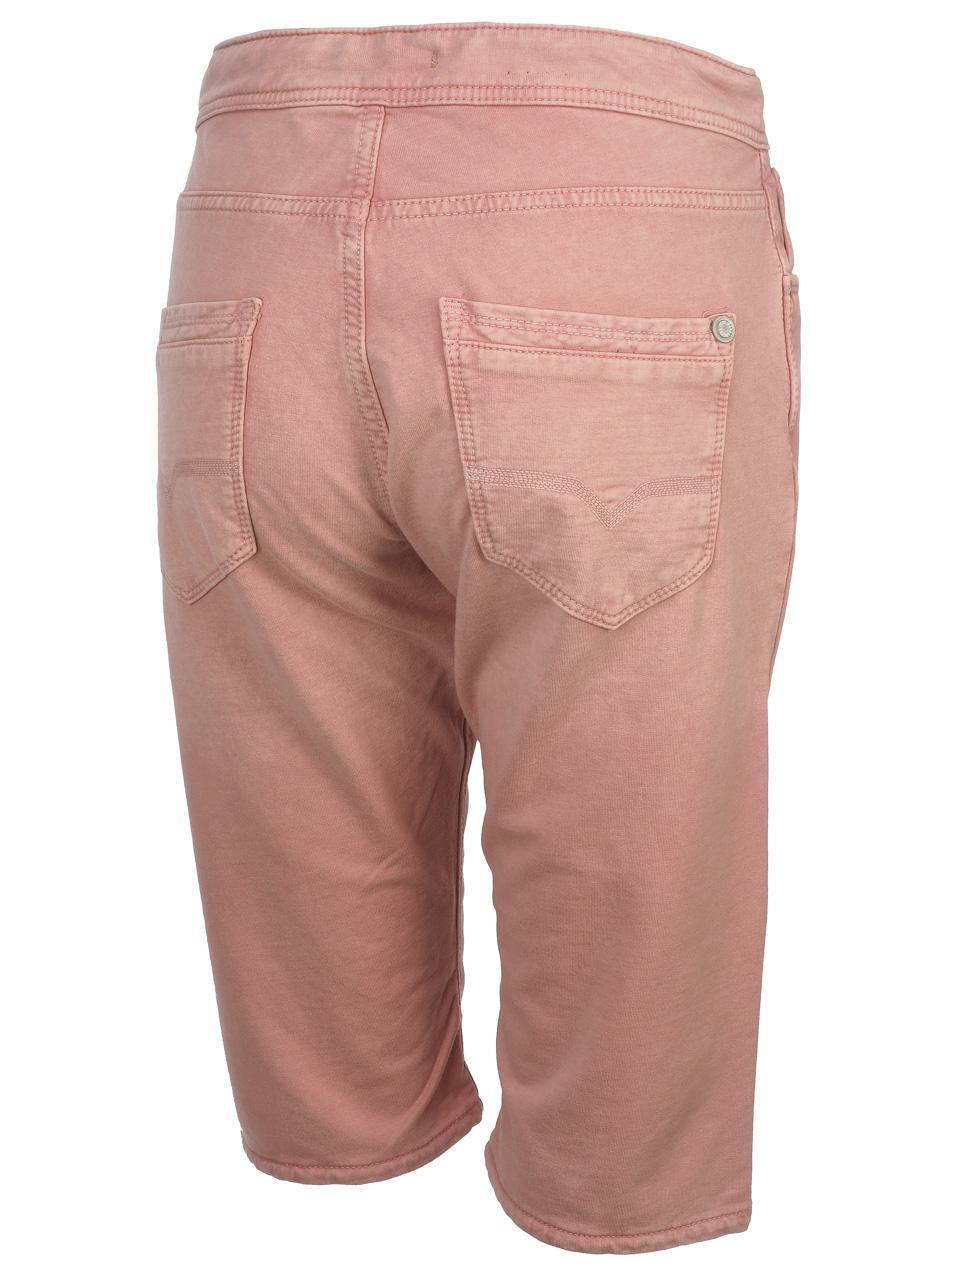 Bermuda-Shorts-Pepe-Jeans-Gene-Pink-Shorts-Jr-Pink-51544-New thumbnail 4